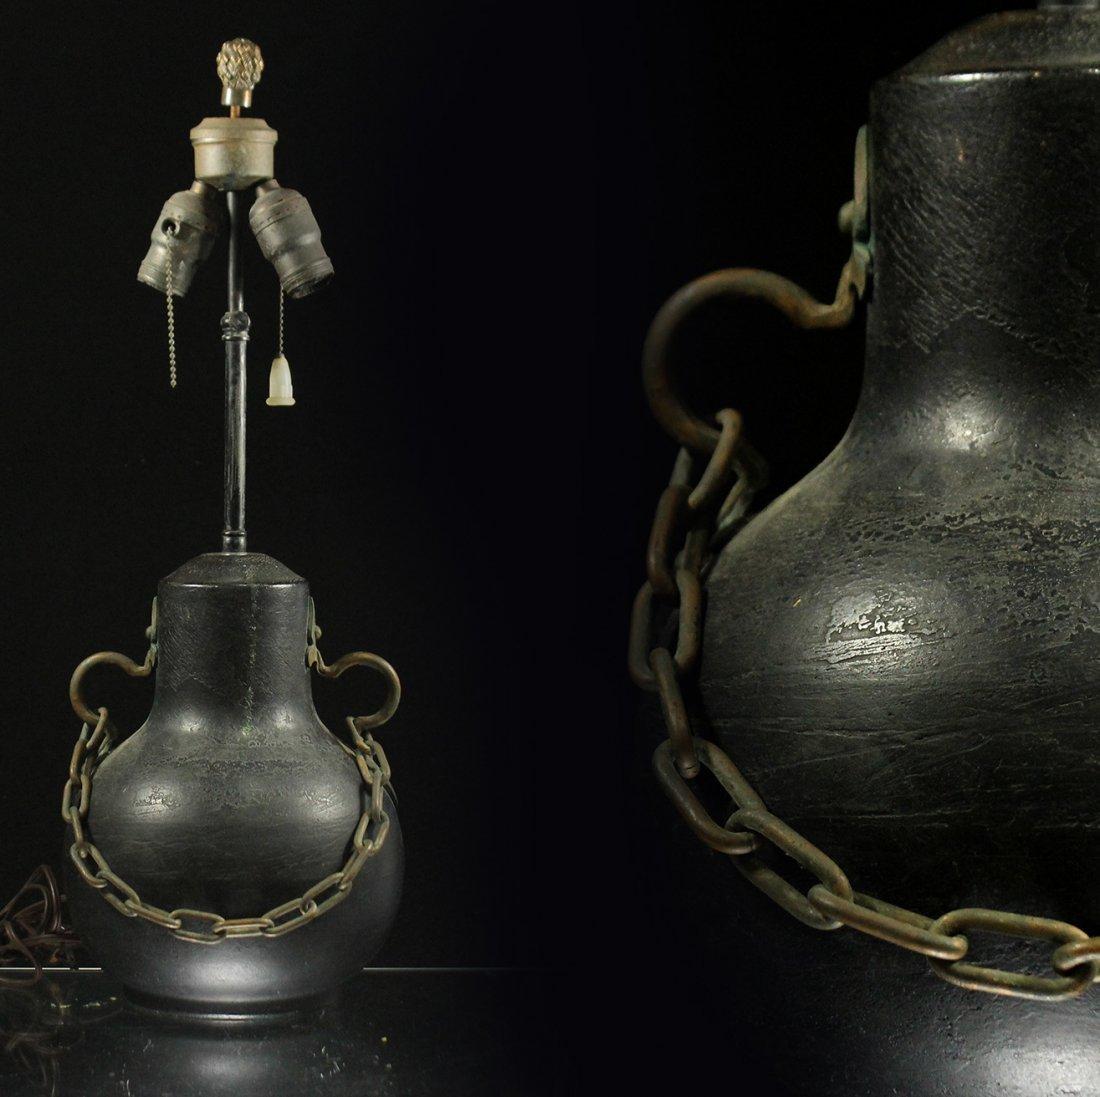 Unique BRONZE ARTS & CRAFTS LAMP BRASS HANDLES & CHAIN